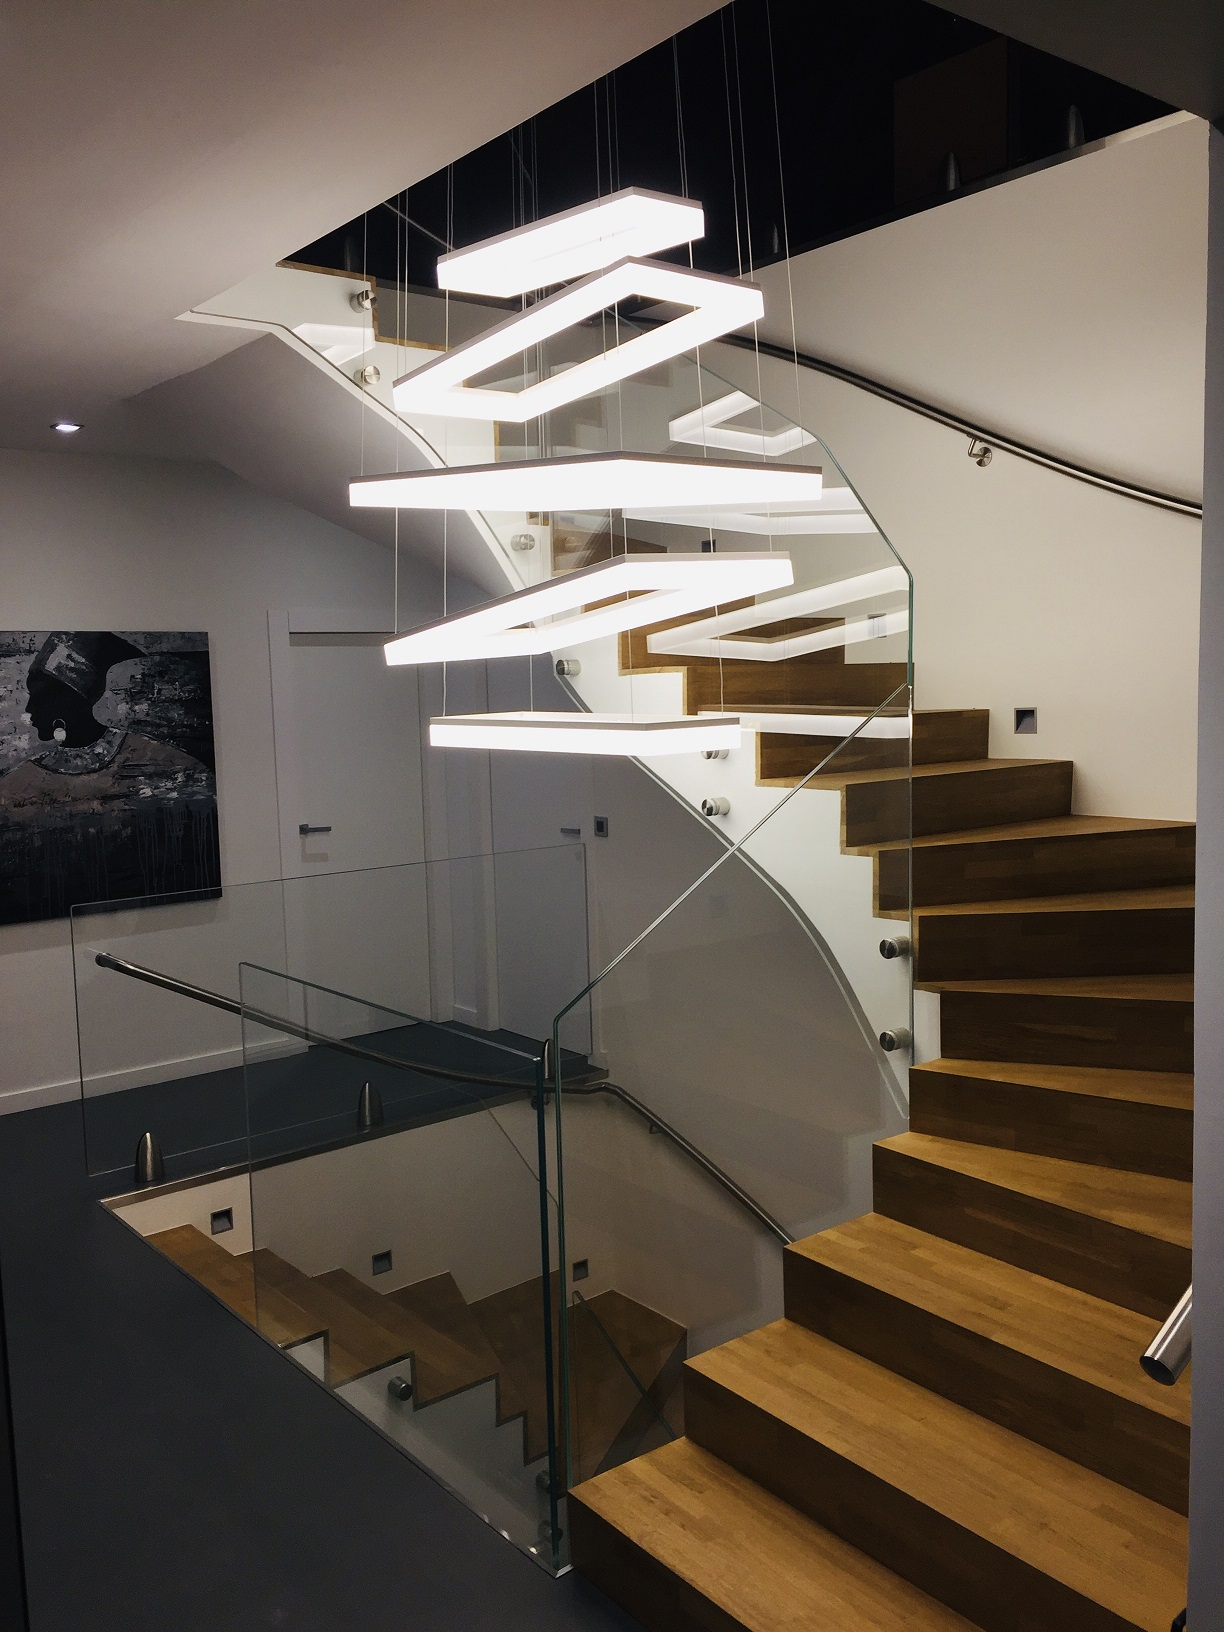 Fabricant D Escalier Bois fabricant escalier sur mesure a talloires | fabricant